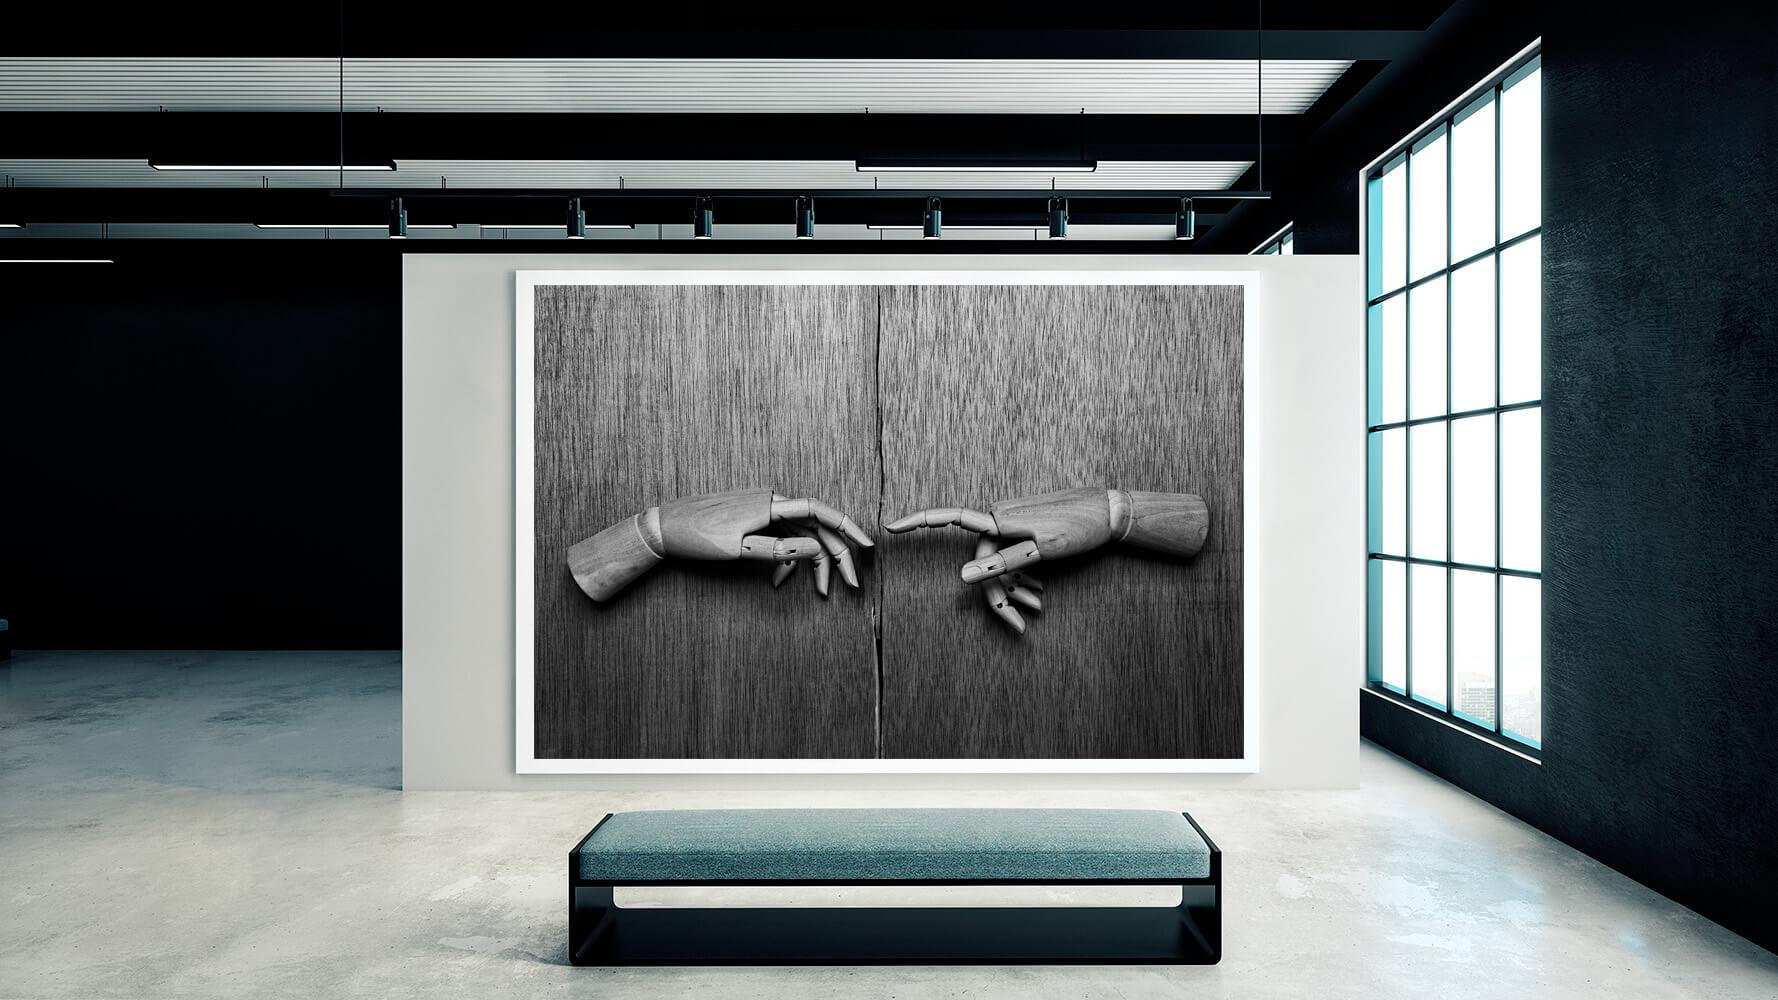 Viktor-van-der-lak-creation-moment-exposicion-talk-to-me-Horno-Virtual-Gallery-galeria-arte-fotografia-artistica-edicion-limitada-decoracio